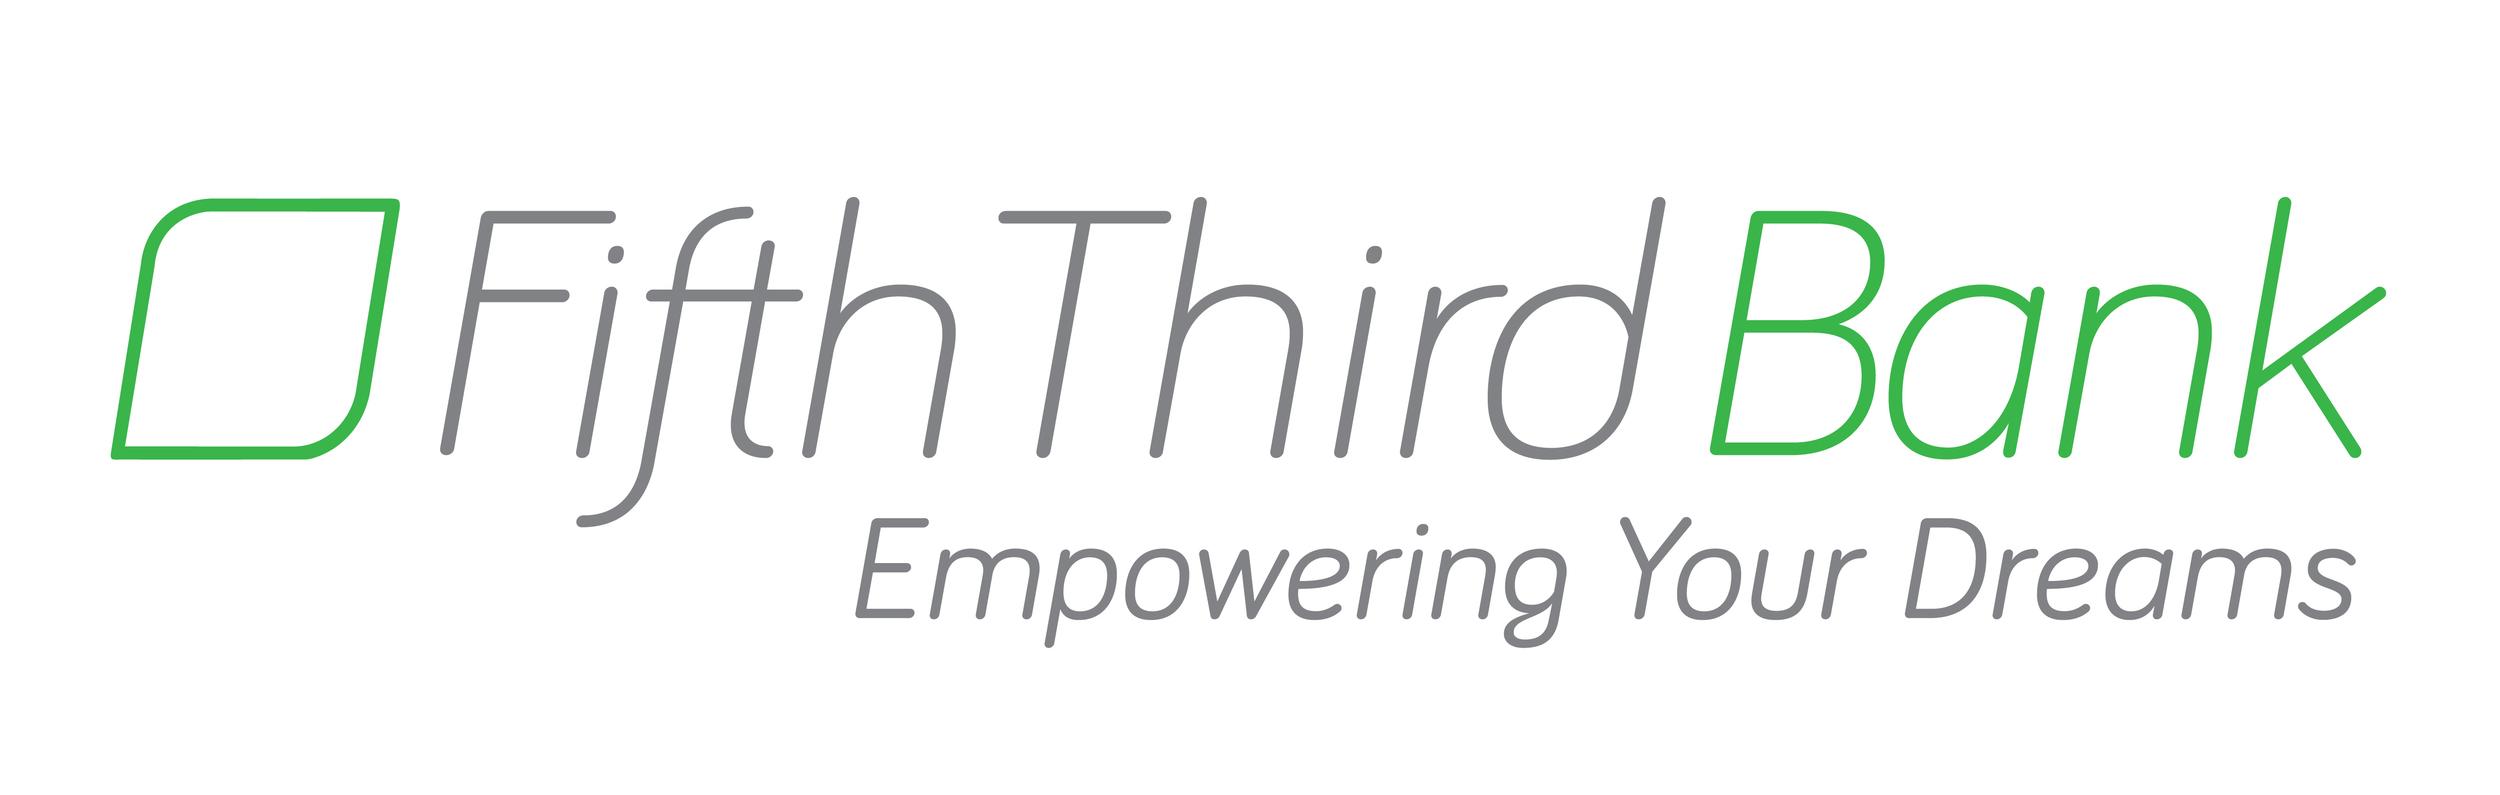 Fifth Third Logo.jpg